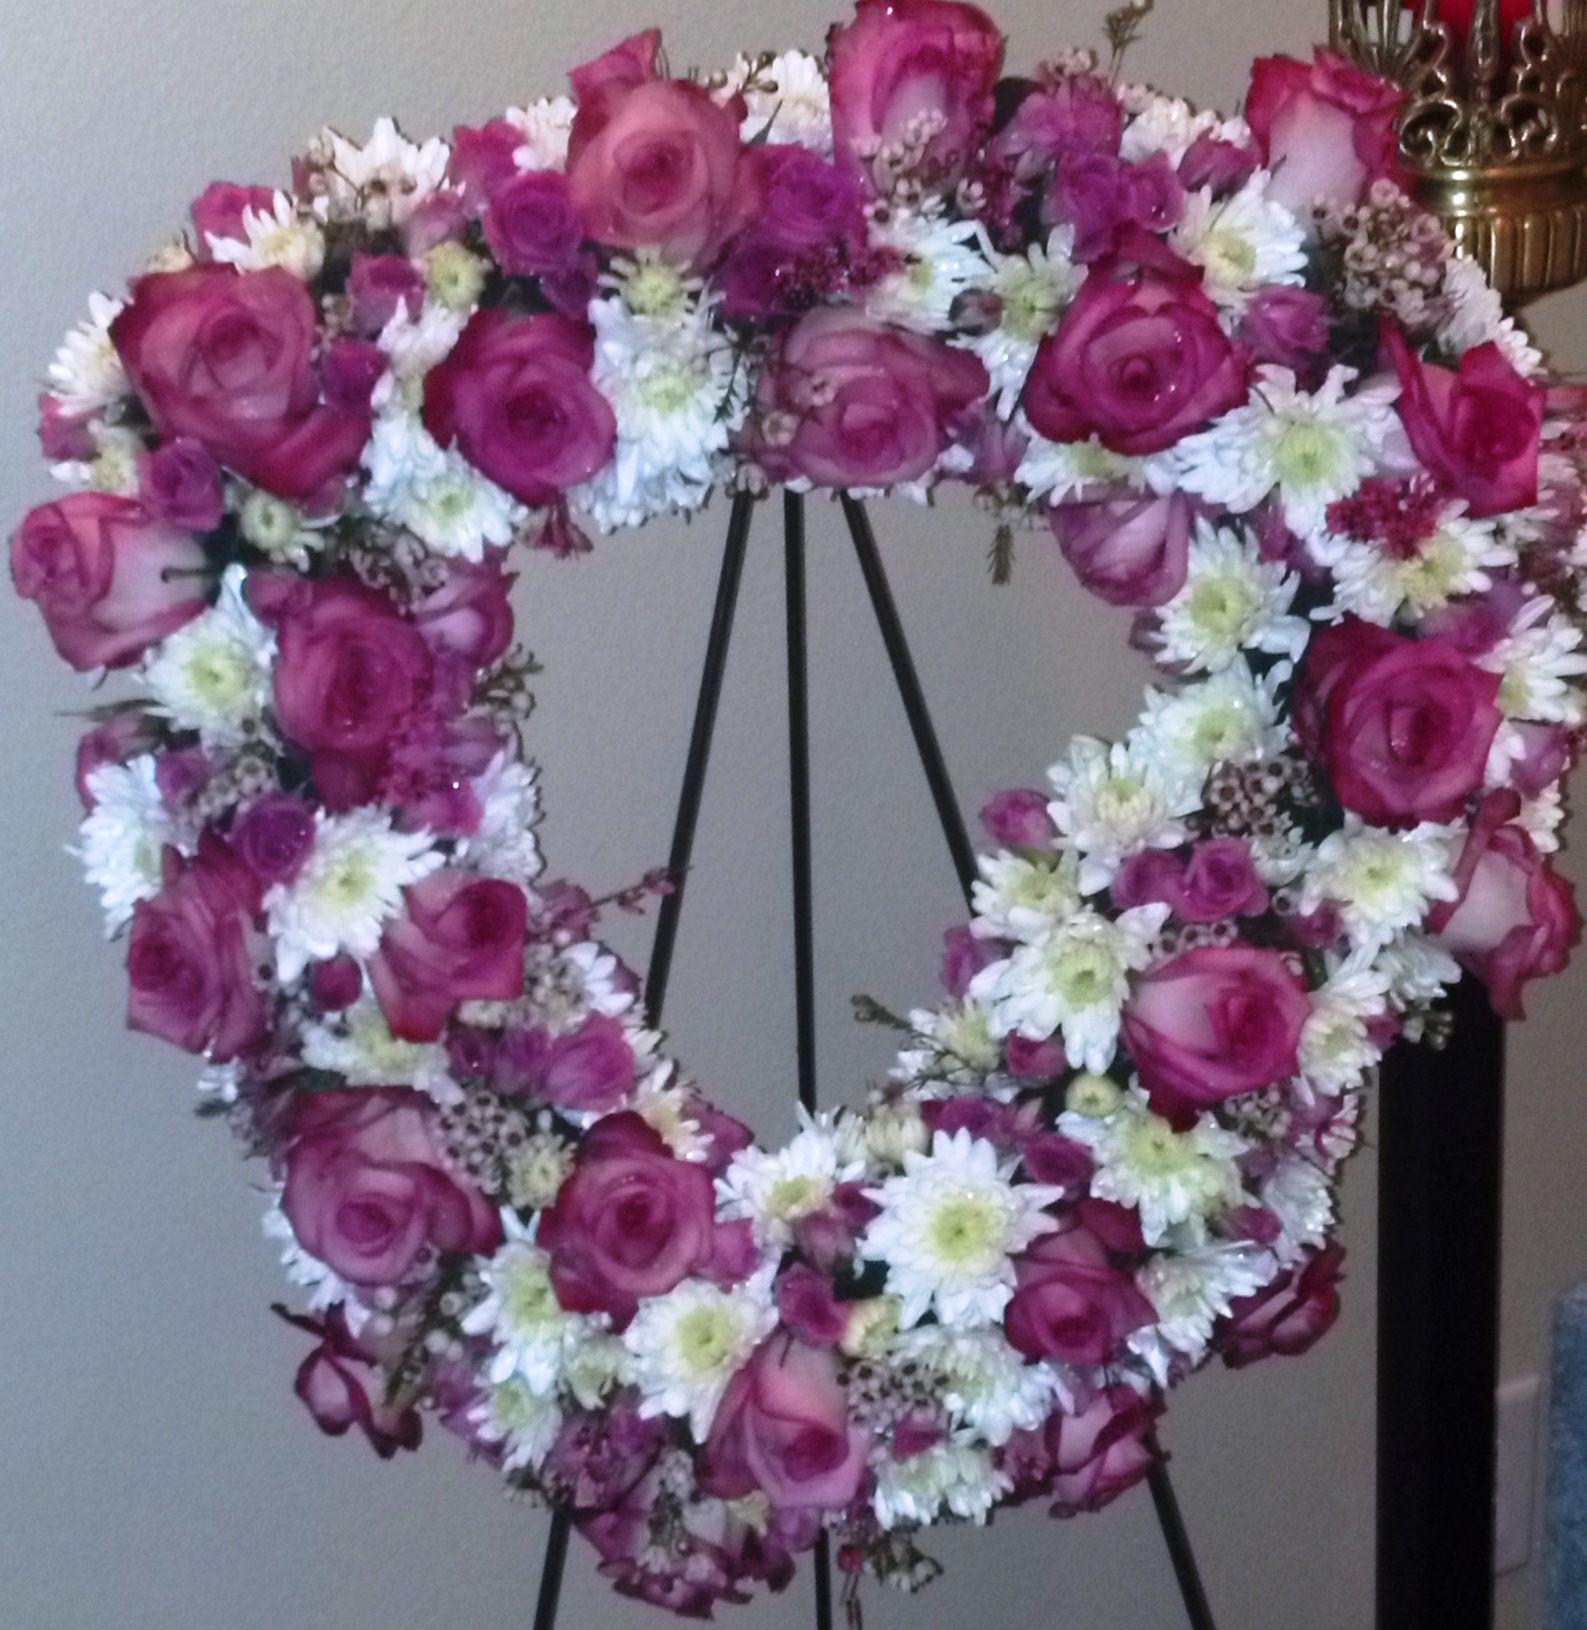 Funeral heart.